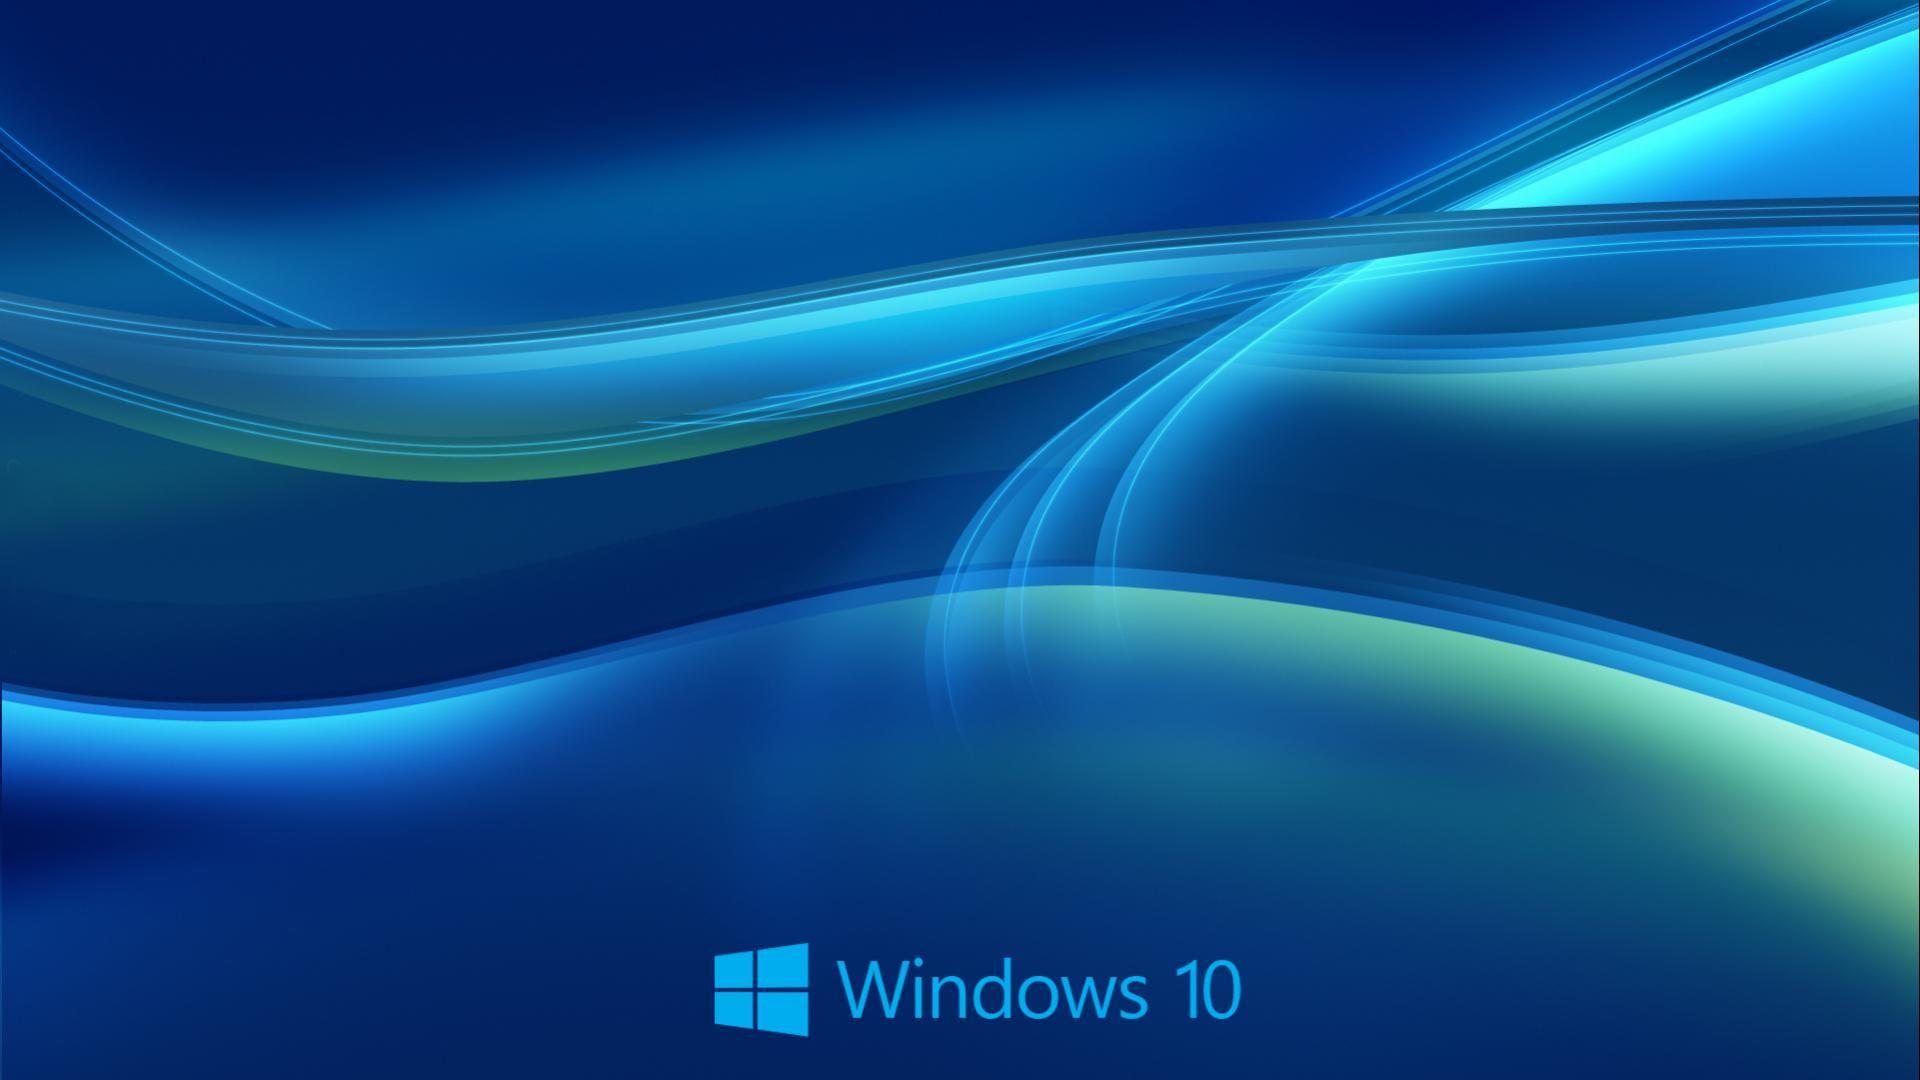 Windows 10 Logo Wallpaper 1920x1080 In 2020 Wallpaper Windows 10 Windows 10 Desktop Backgrounds Windows 10